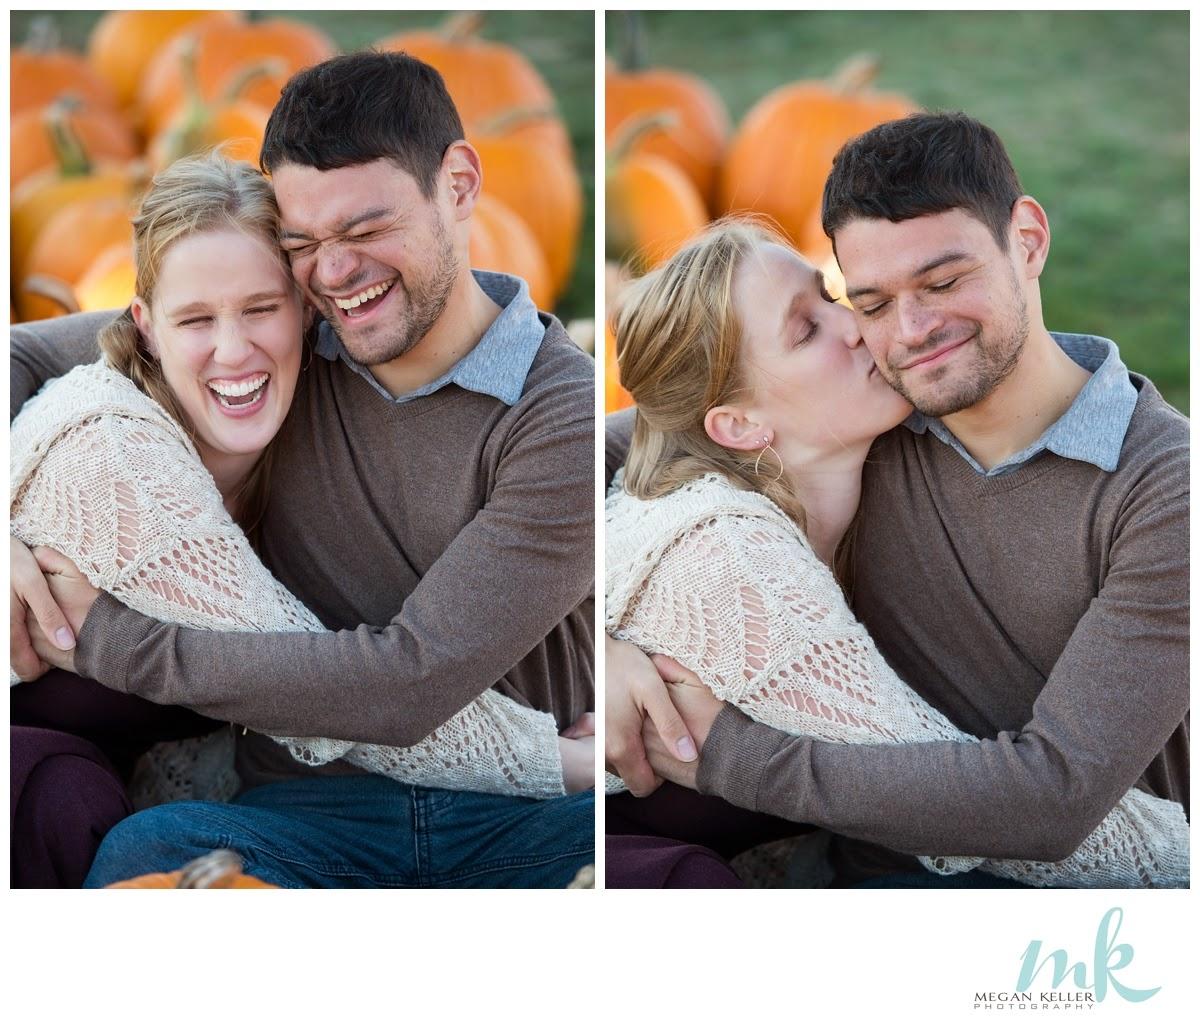 Bethany and Eli's Engagement Bethany and Eli's Engagement 2014 10 28 0017